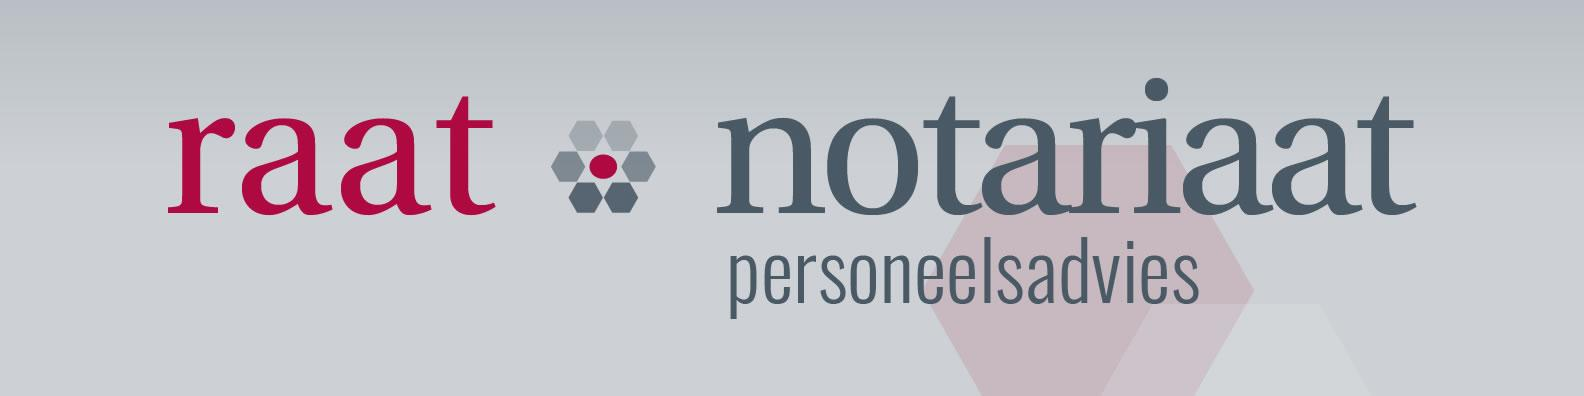 Kandidaat- notaris 60%